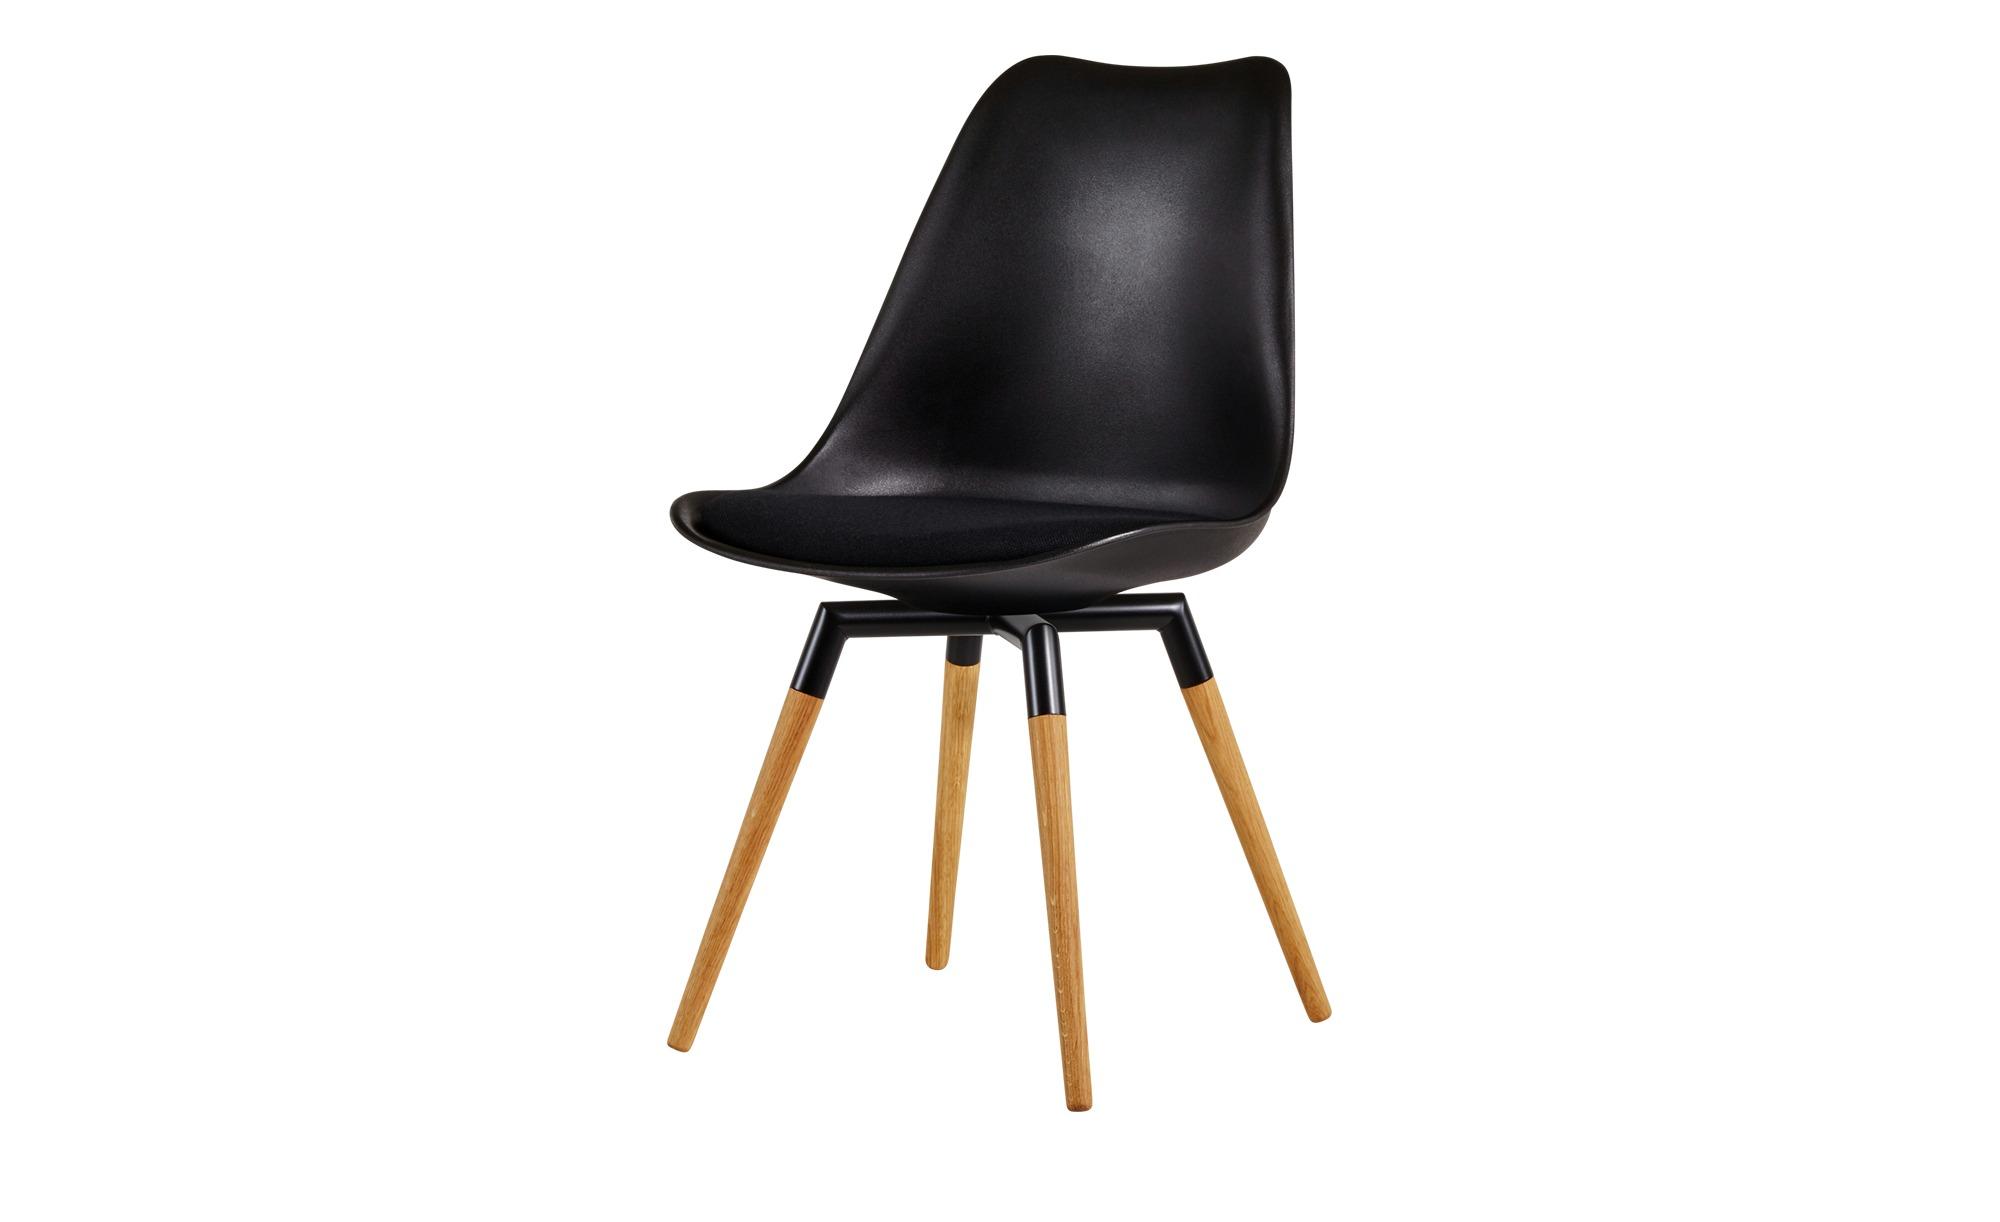 Stühle aus Holz o.Metall günstig bei Höffner kaufen